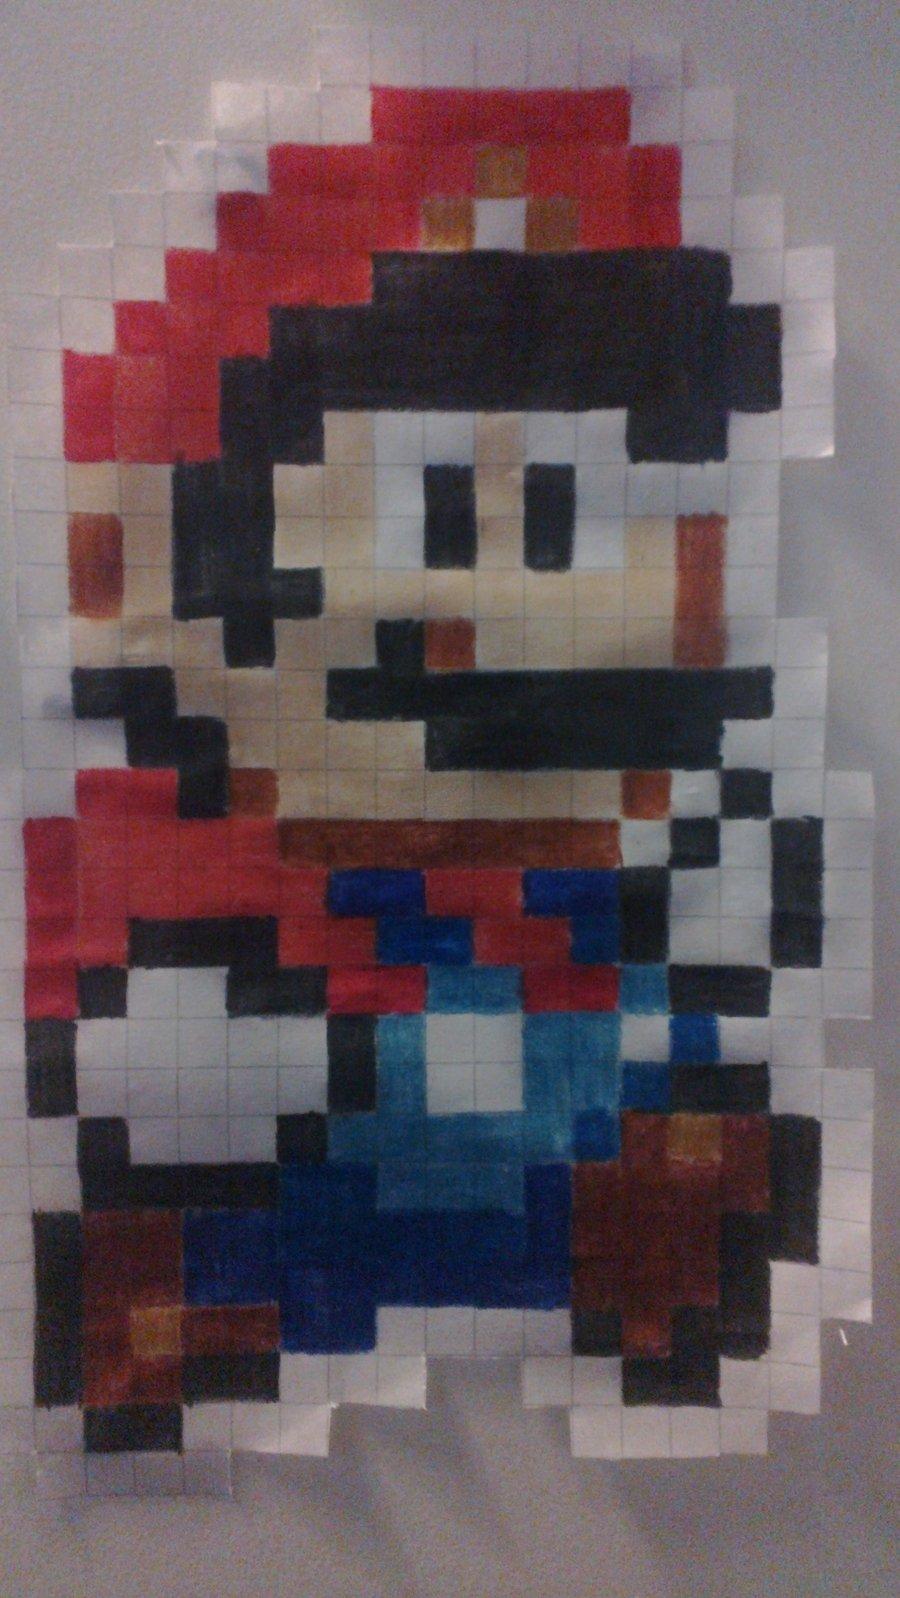 900x1598 16 Bit Mario Drawing By Dexdacozed